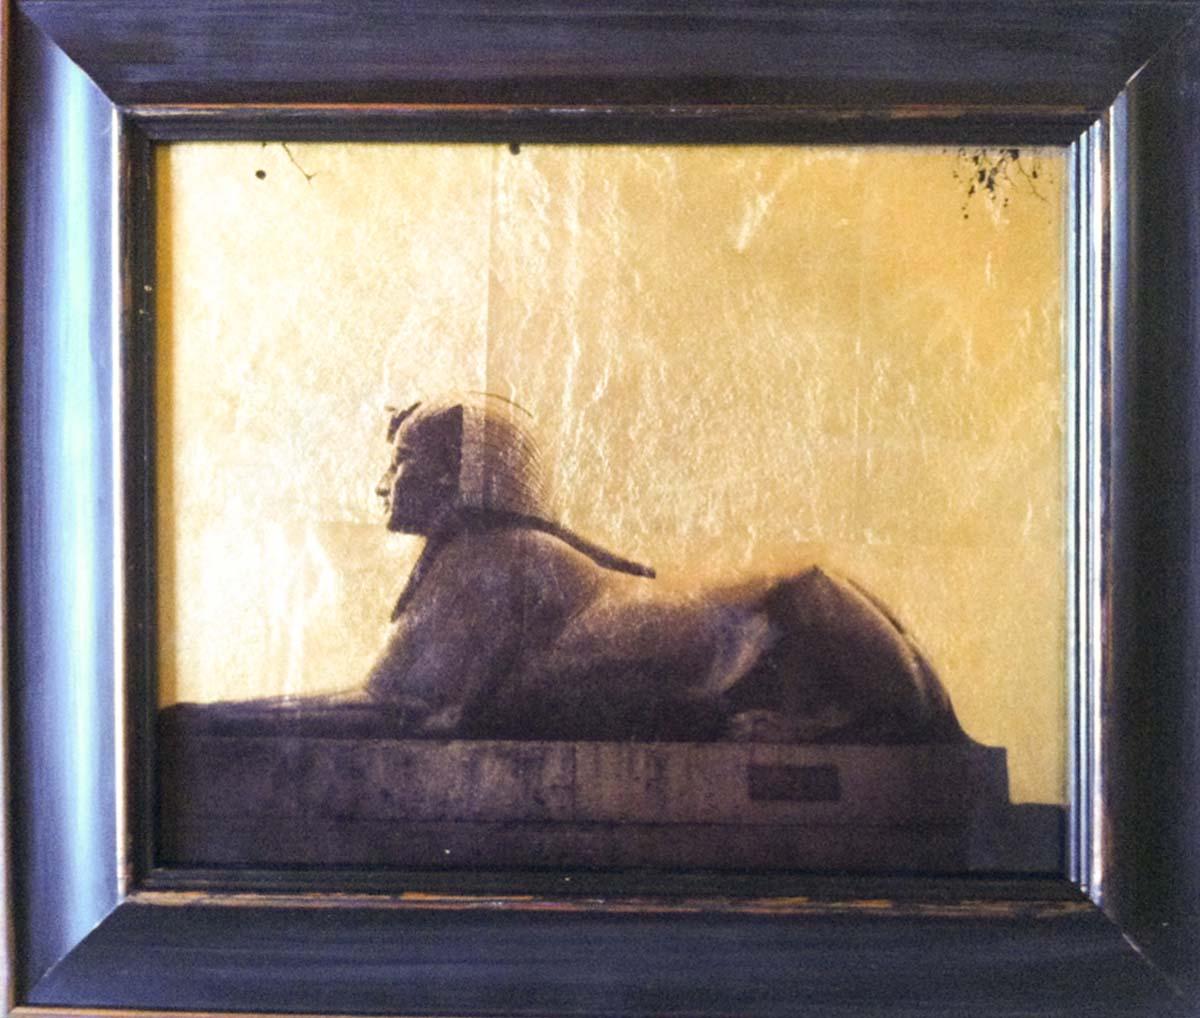 Sphinx, River Thames